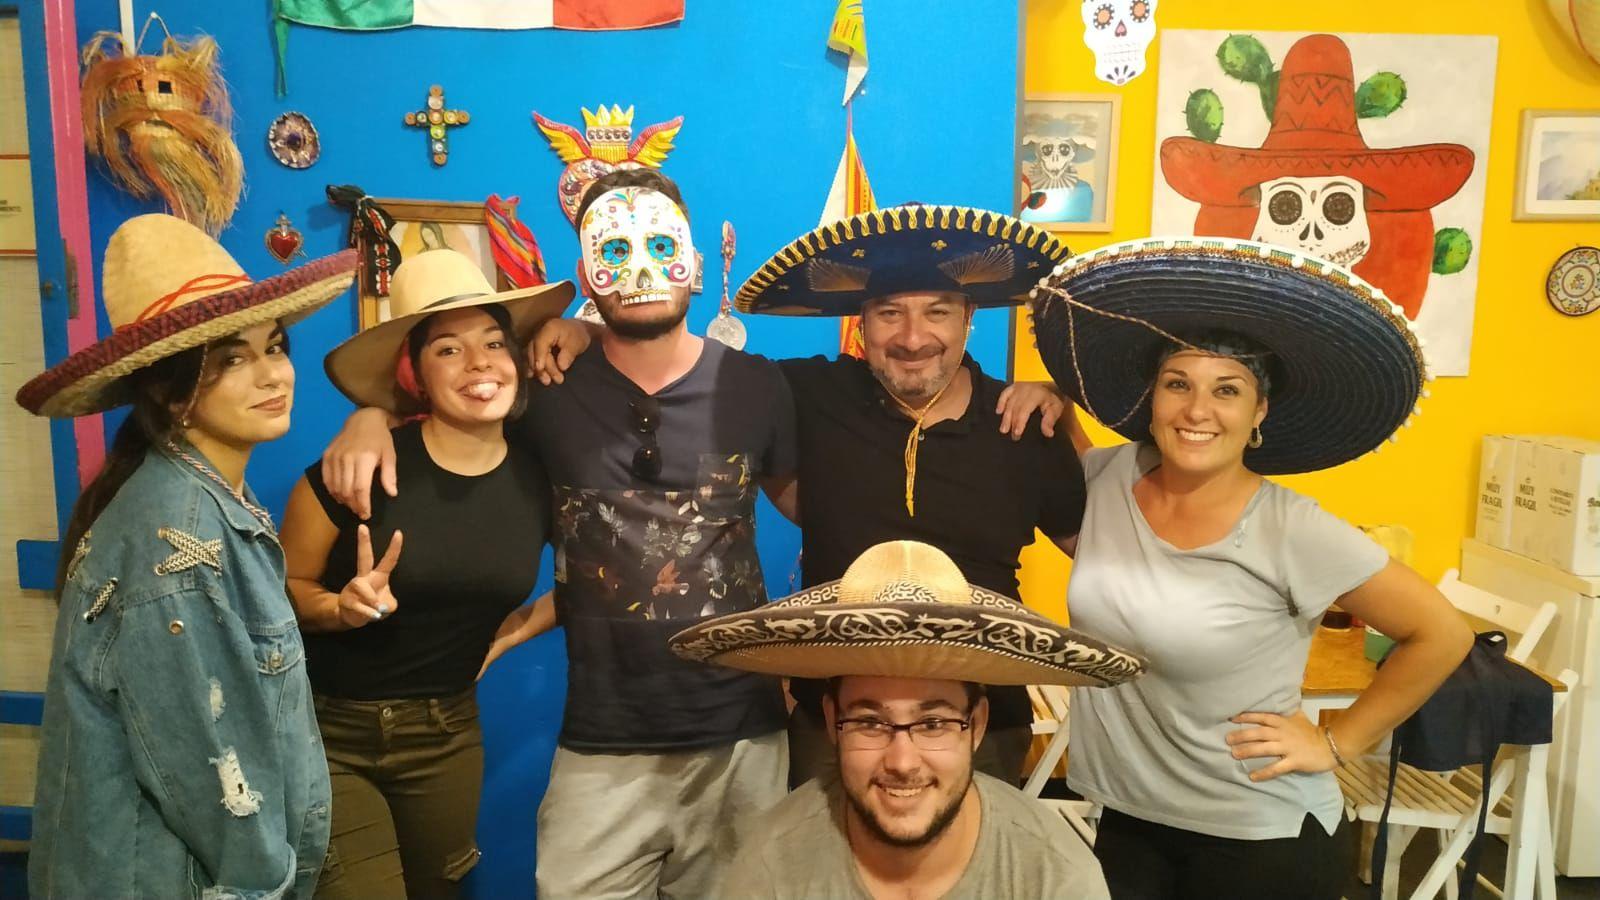 Foto 23 de Restaurante mexicano en  | Cantina La Catrina